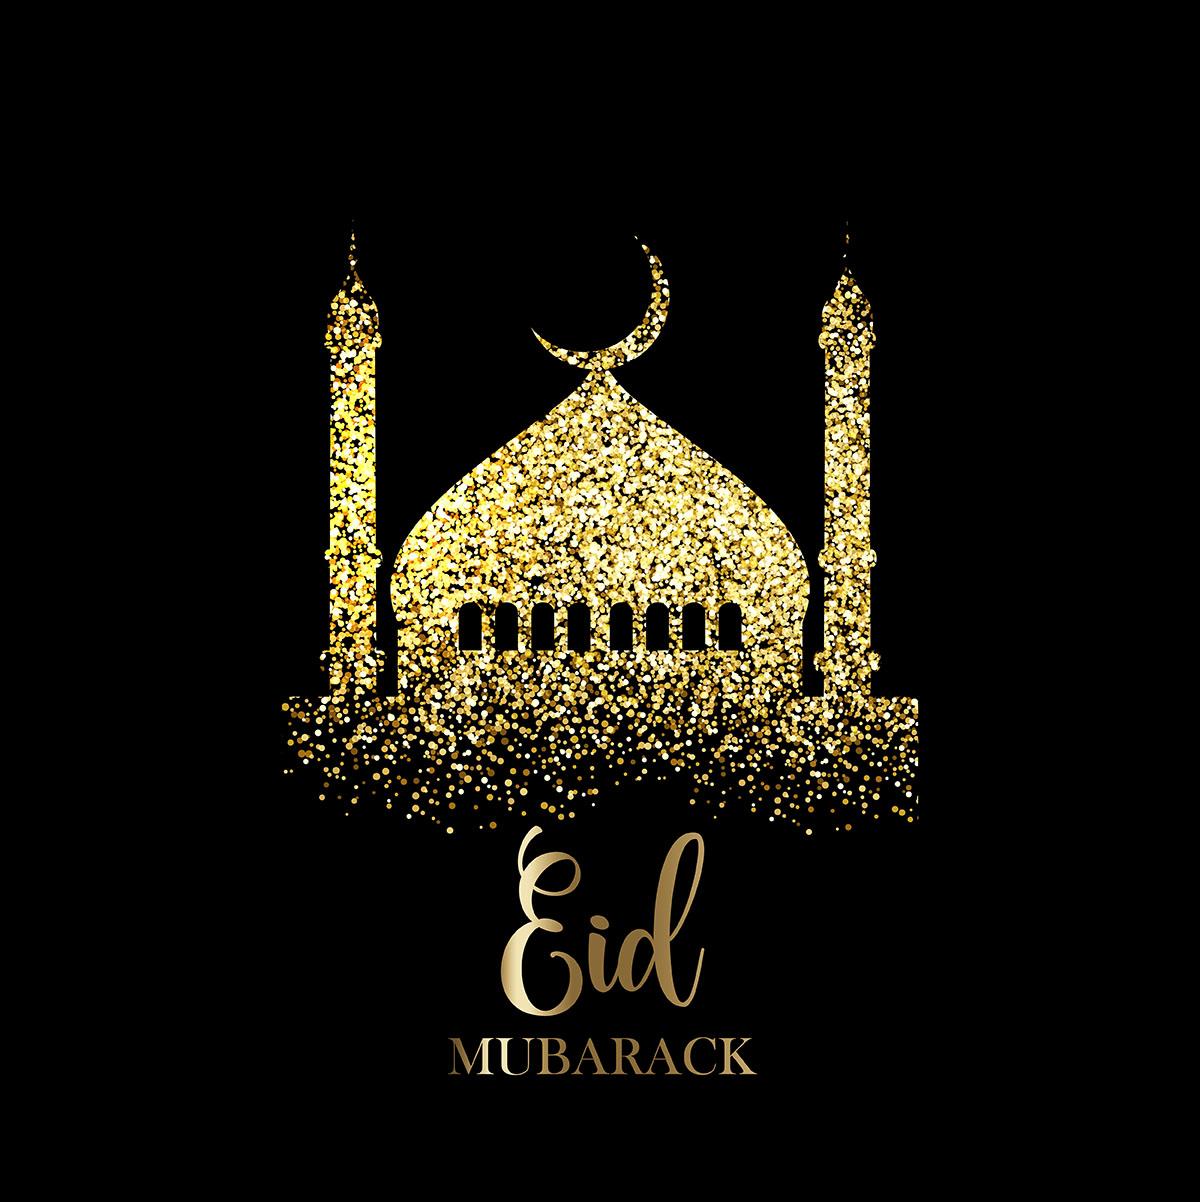 Glitter Eid Mubarak background - Download Free Vectors, Clipart ...